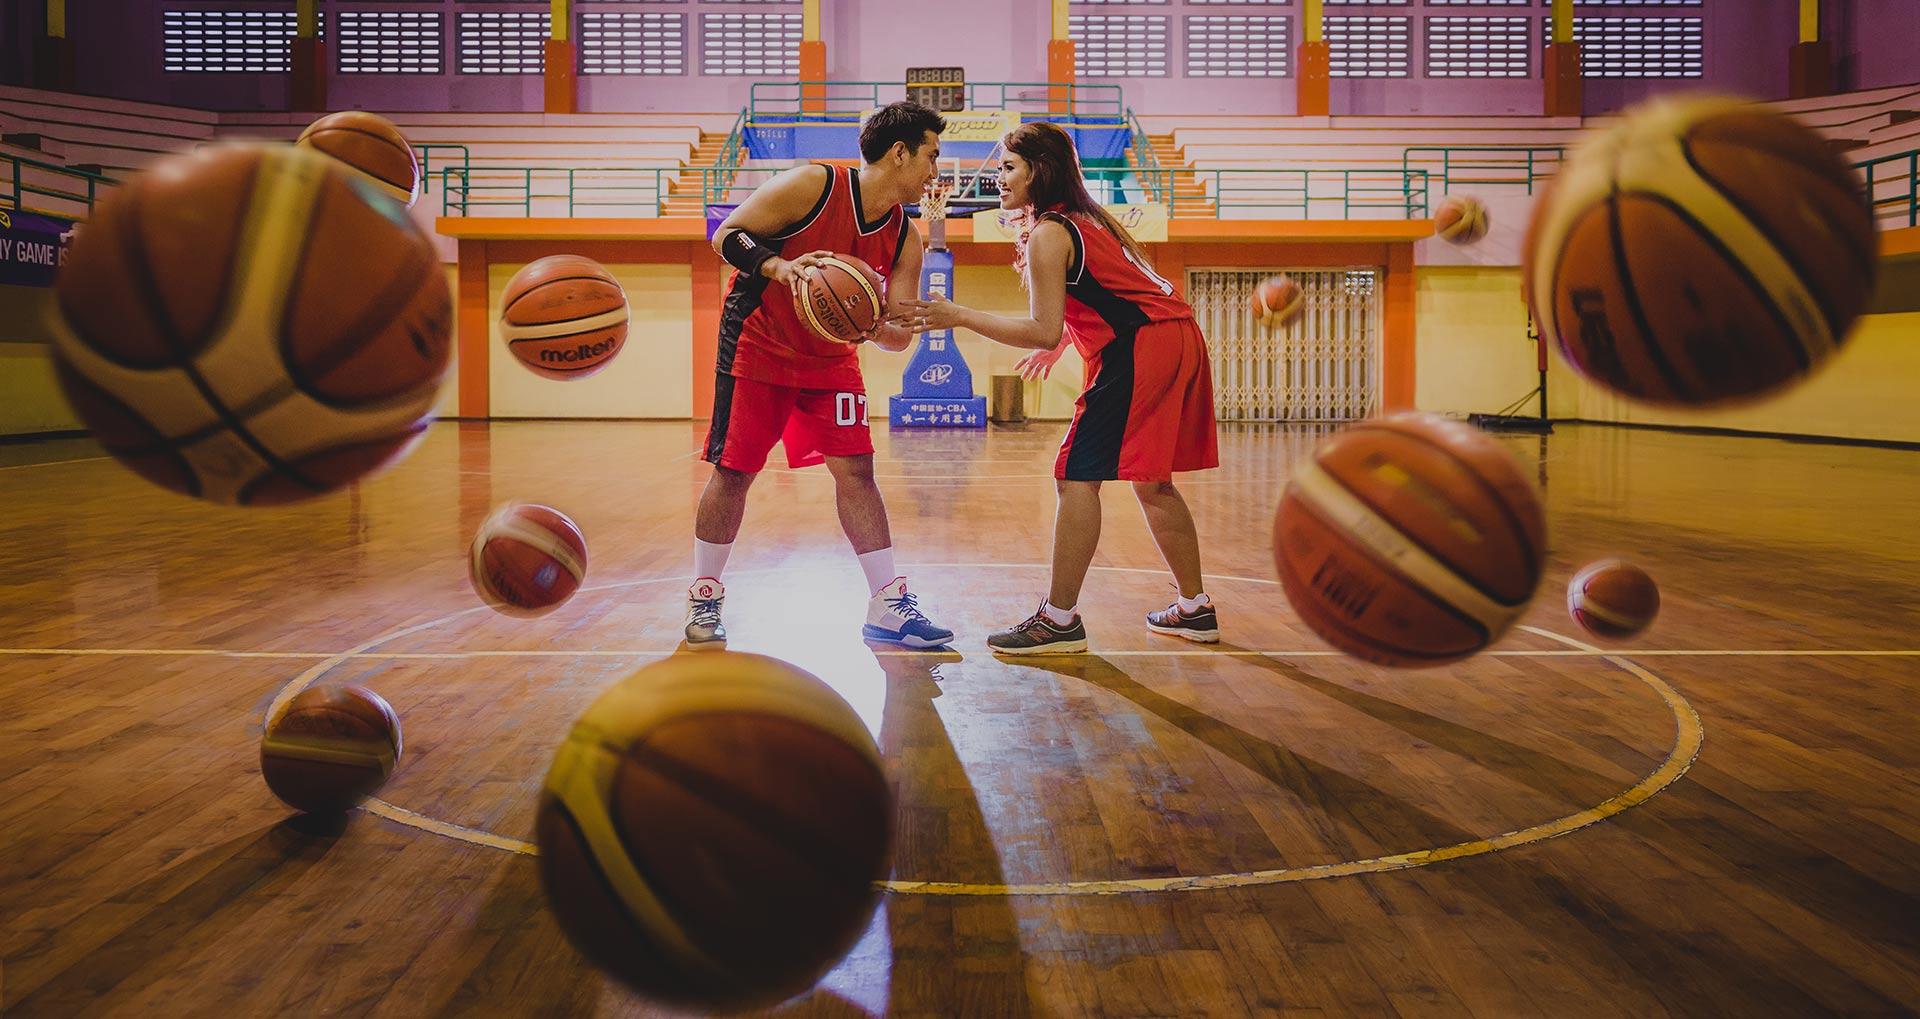 Bali Pre Wedding photographer Basket ball